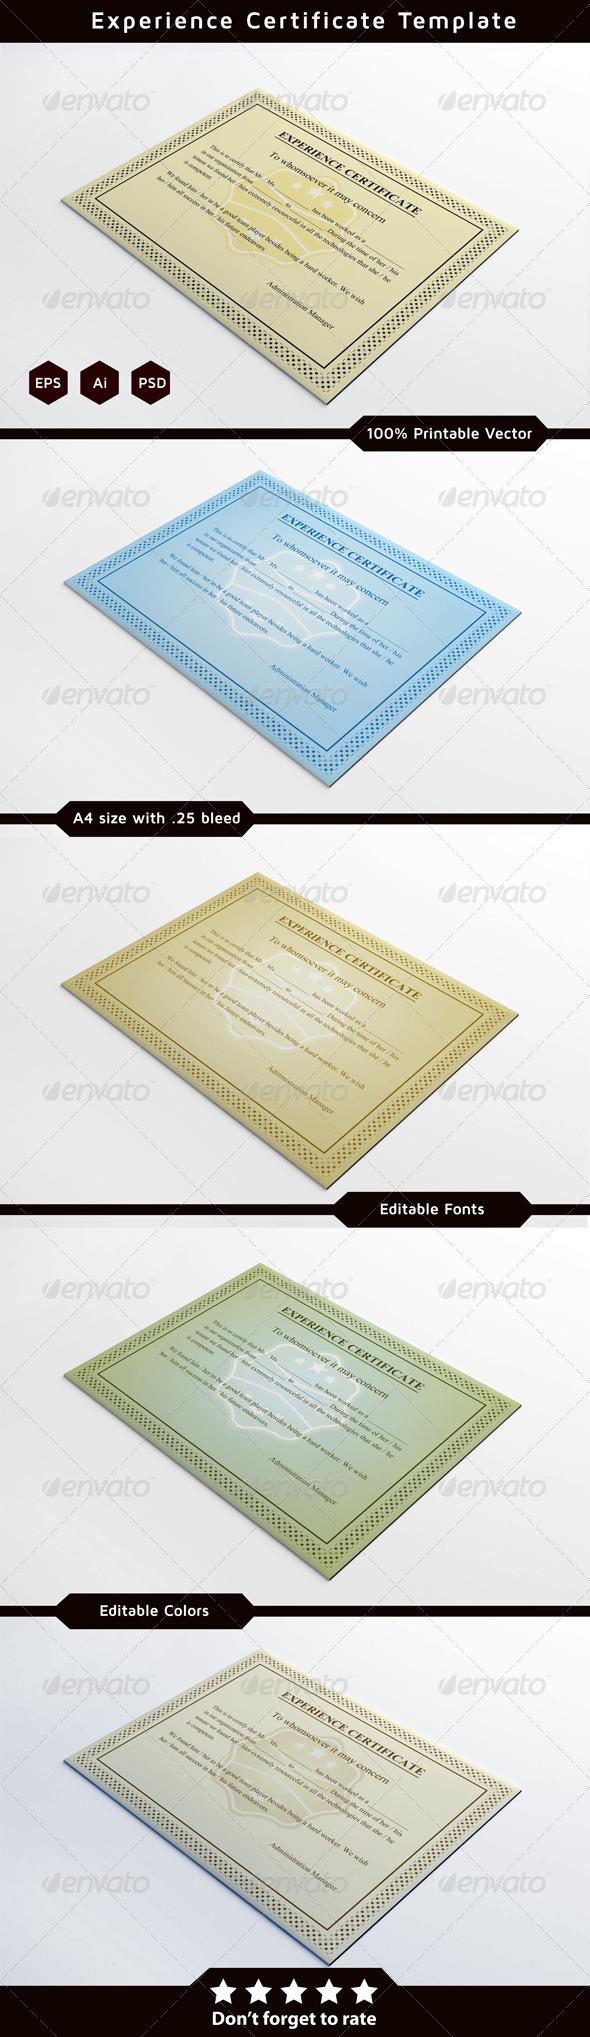 Experience certificates certificate print templates and ai experience certificates yadclub Gallery